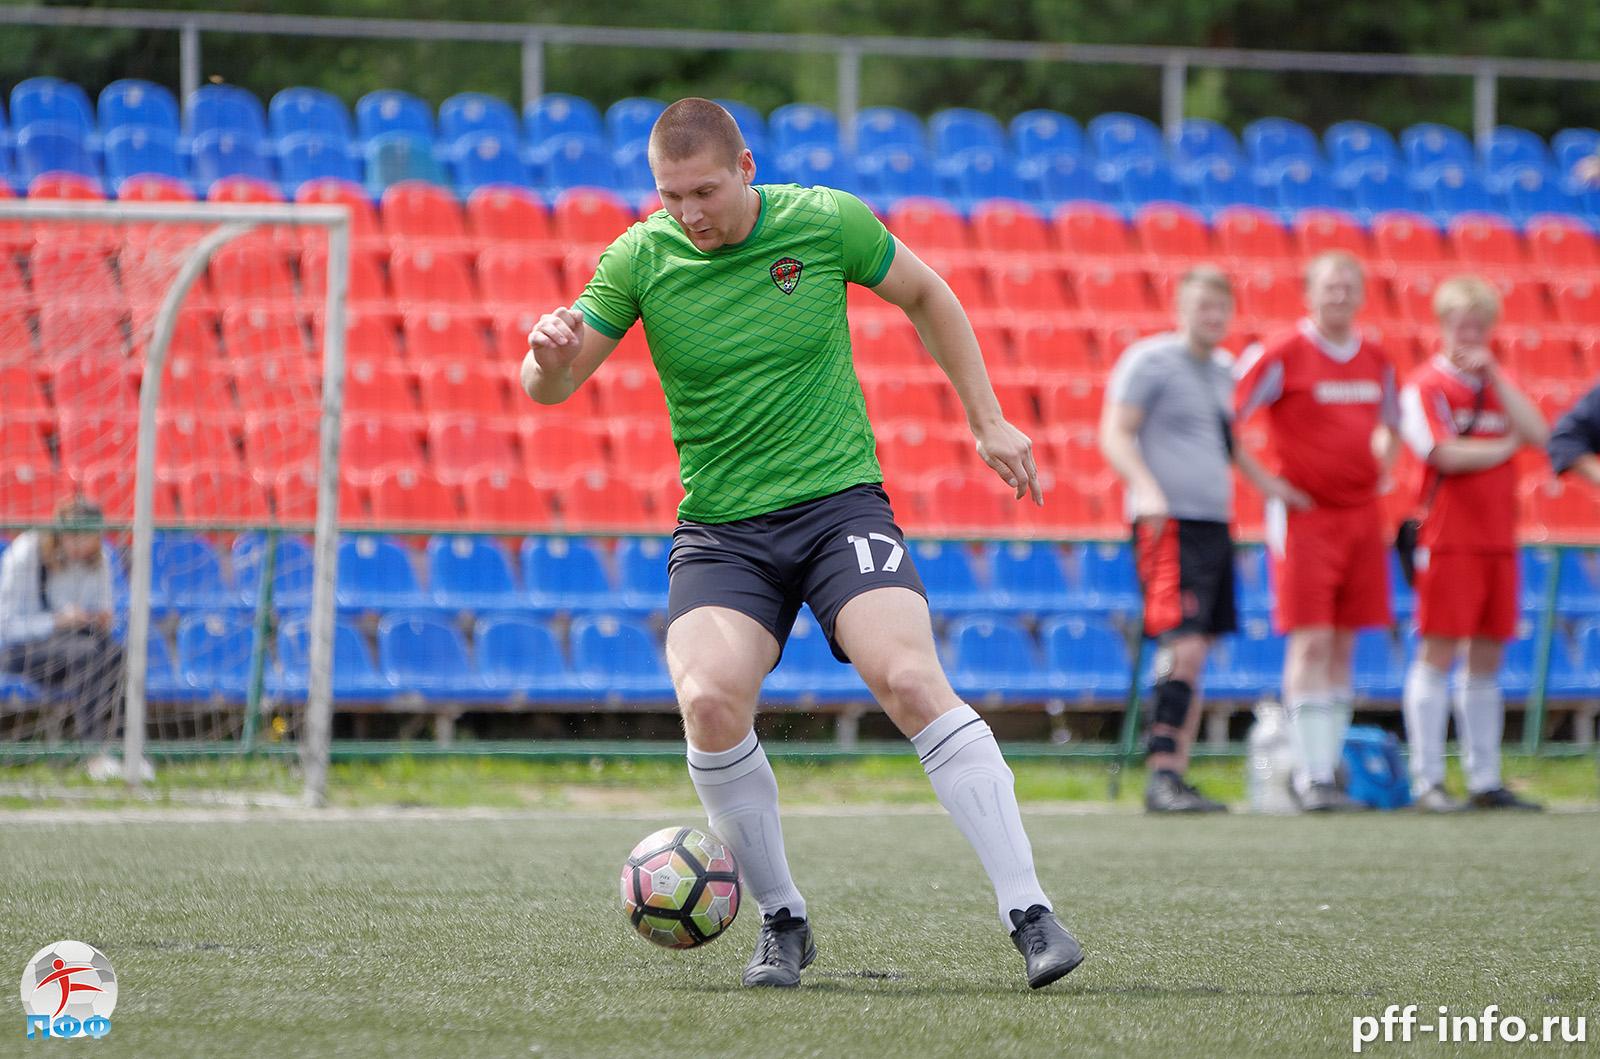 Премьер-лига ТДК. Обзор 4 тура